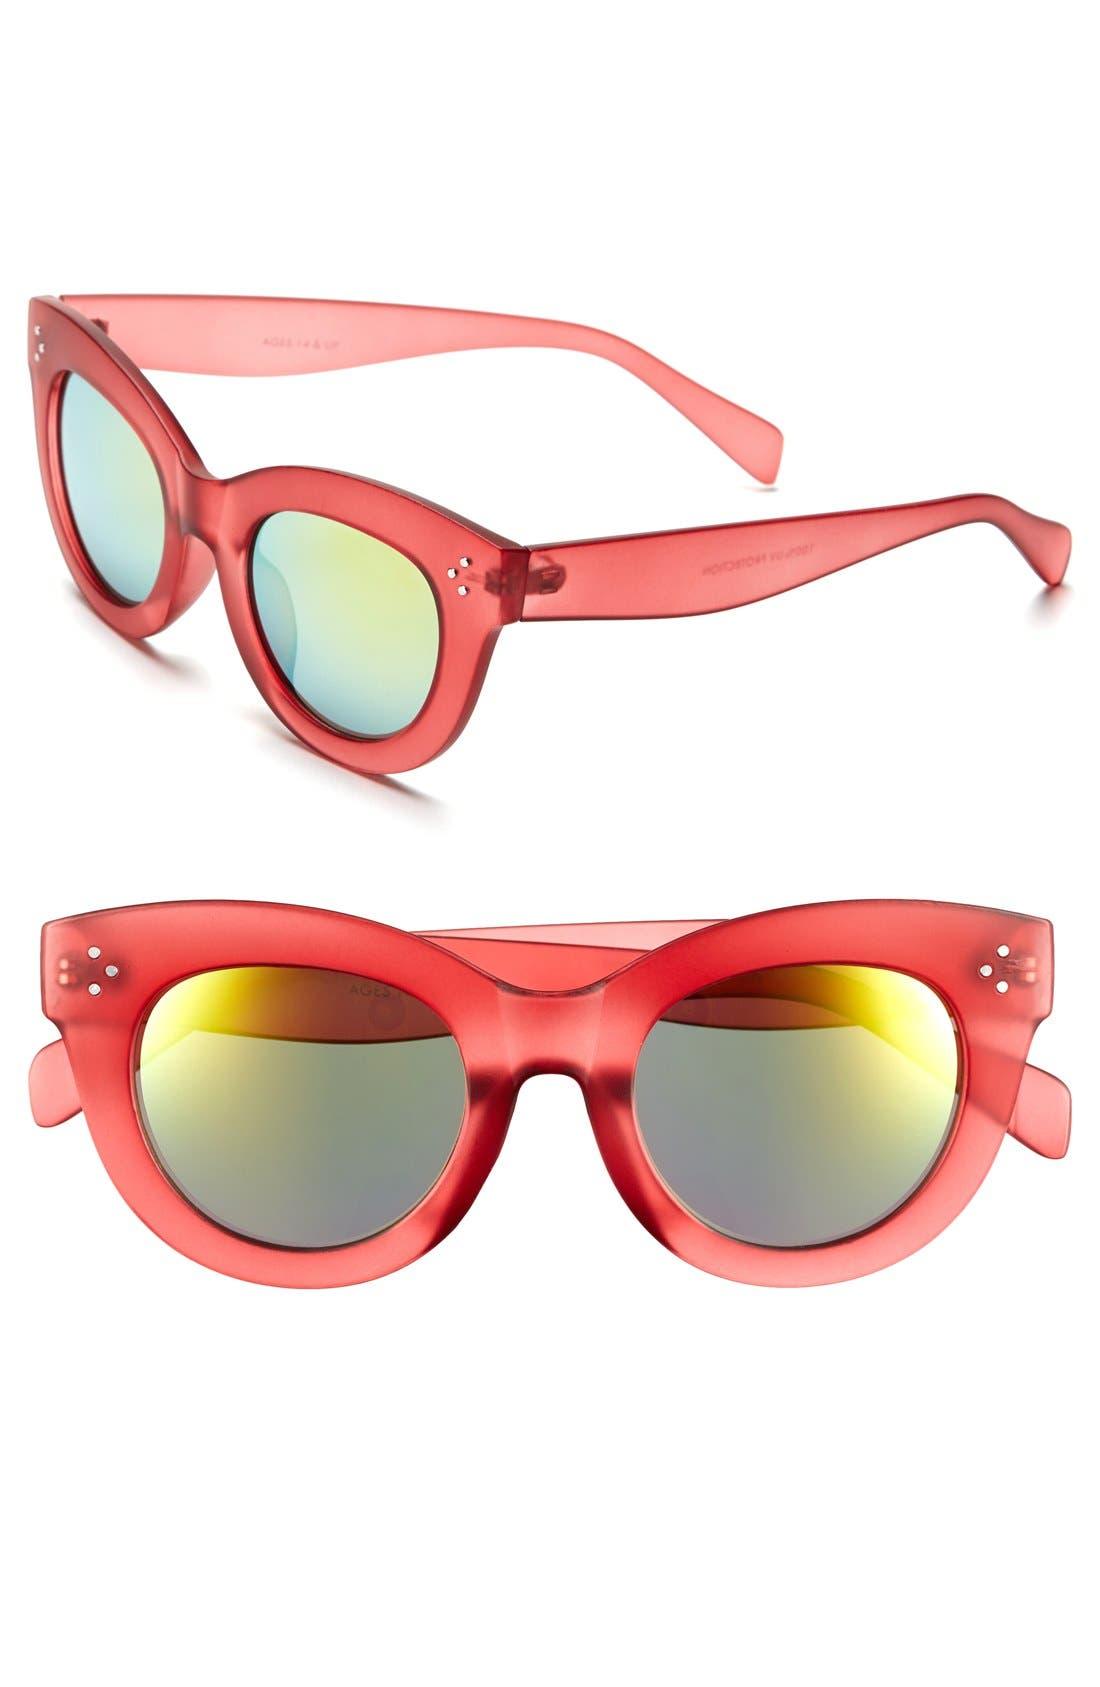 Alternate Image 1 Selected - FE NY 49mm Mirror Lens Sunglasses